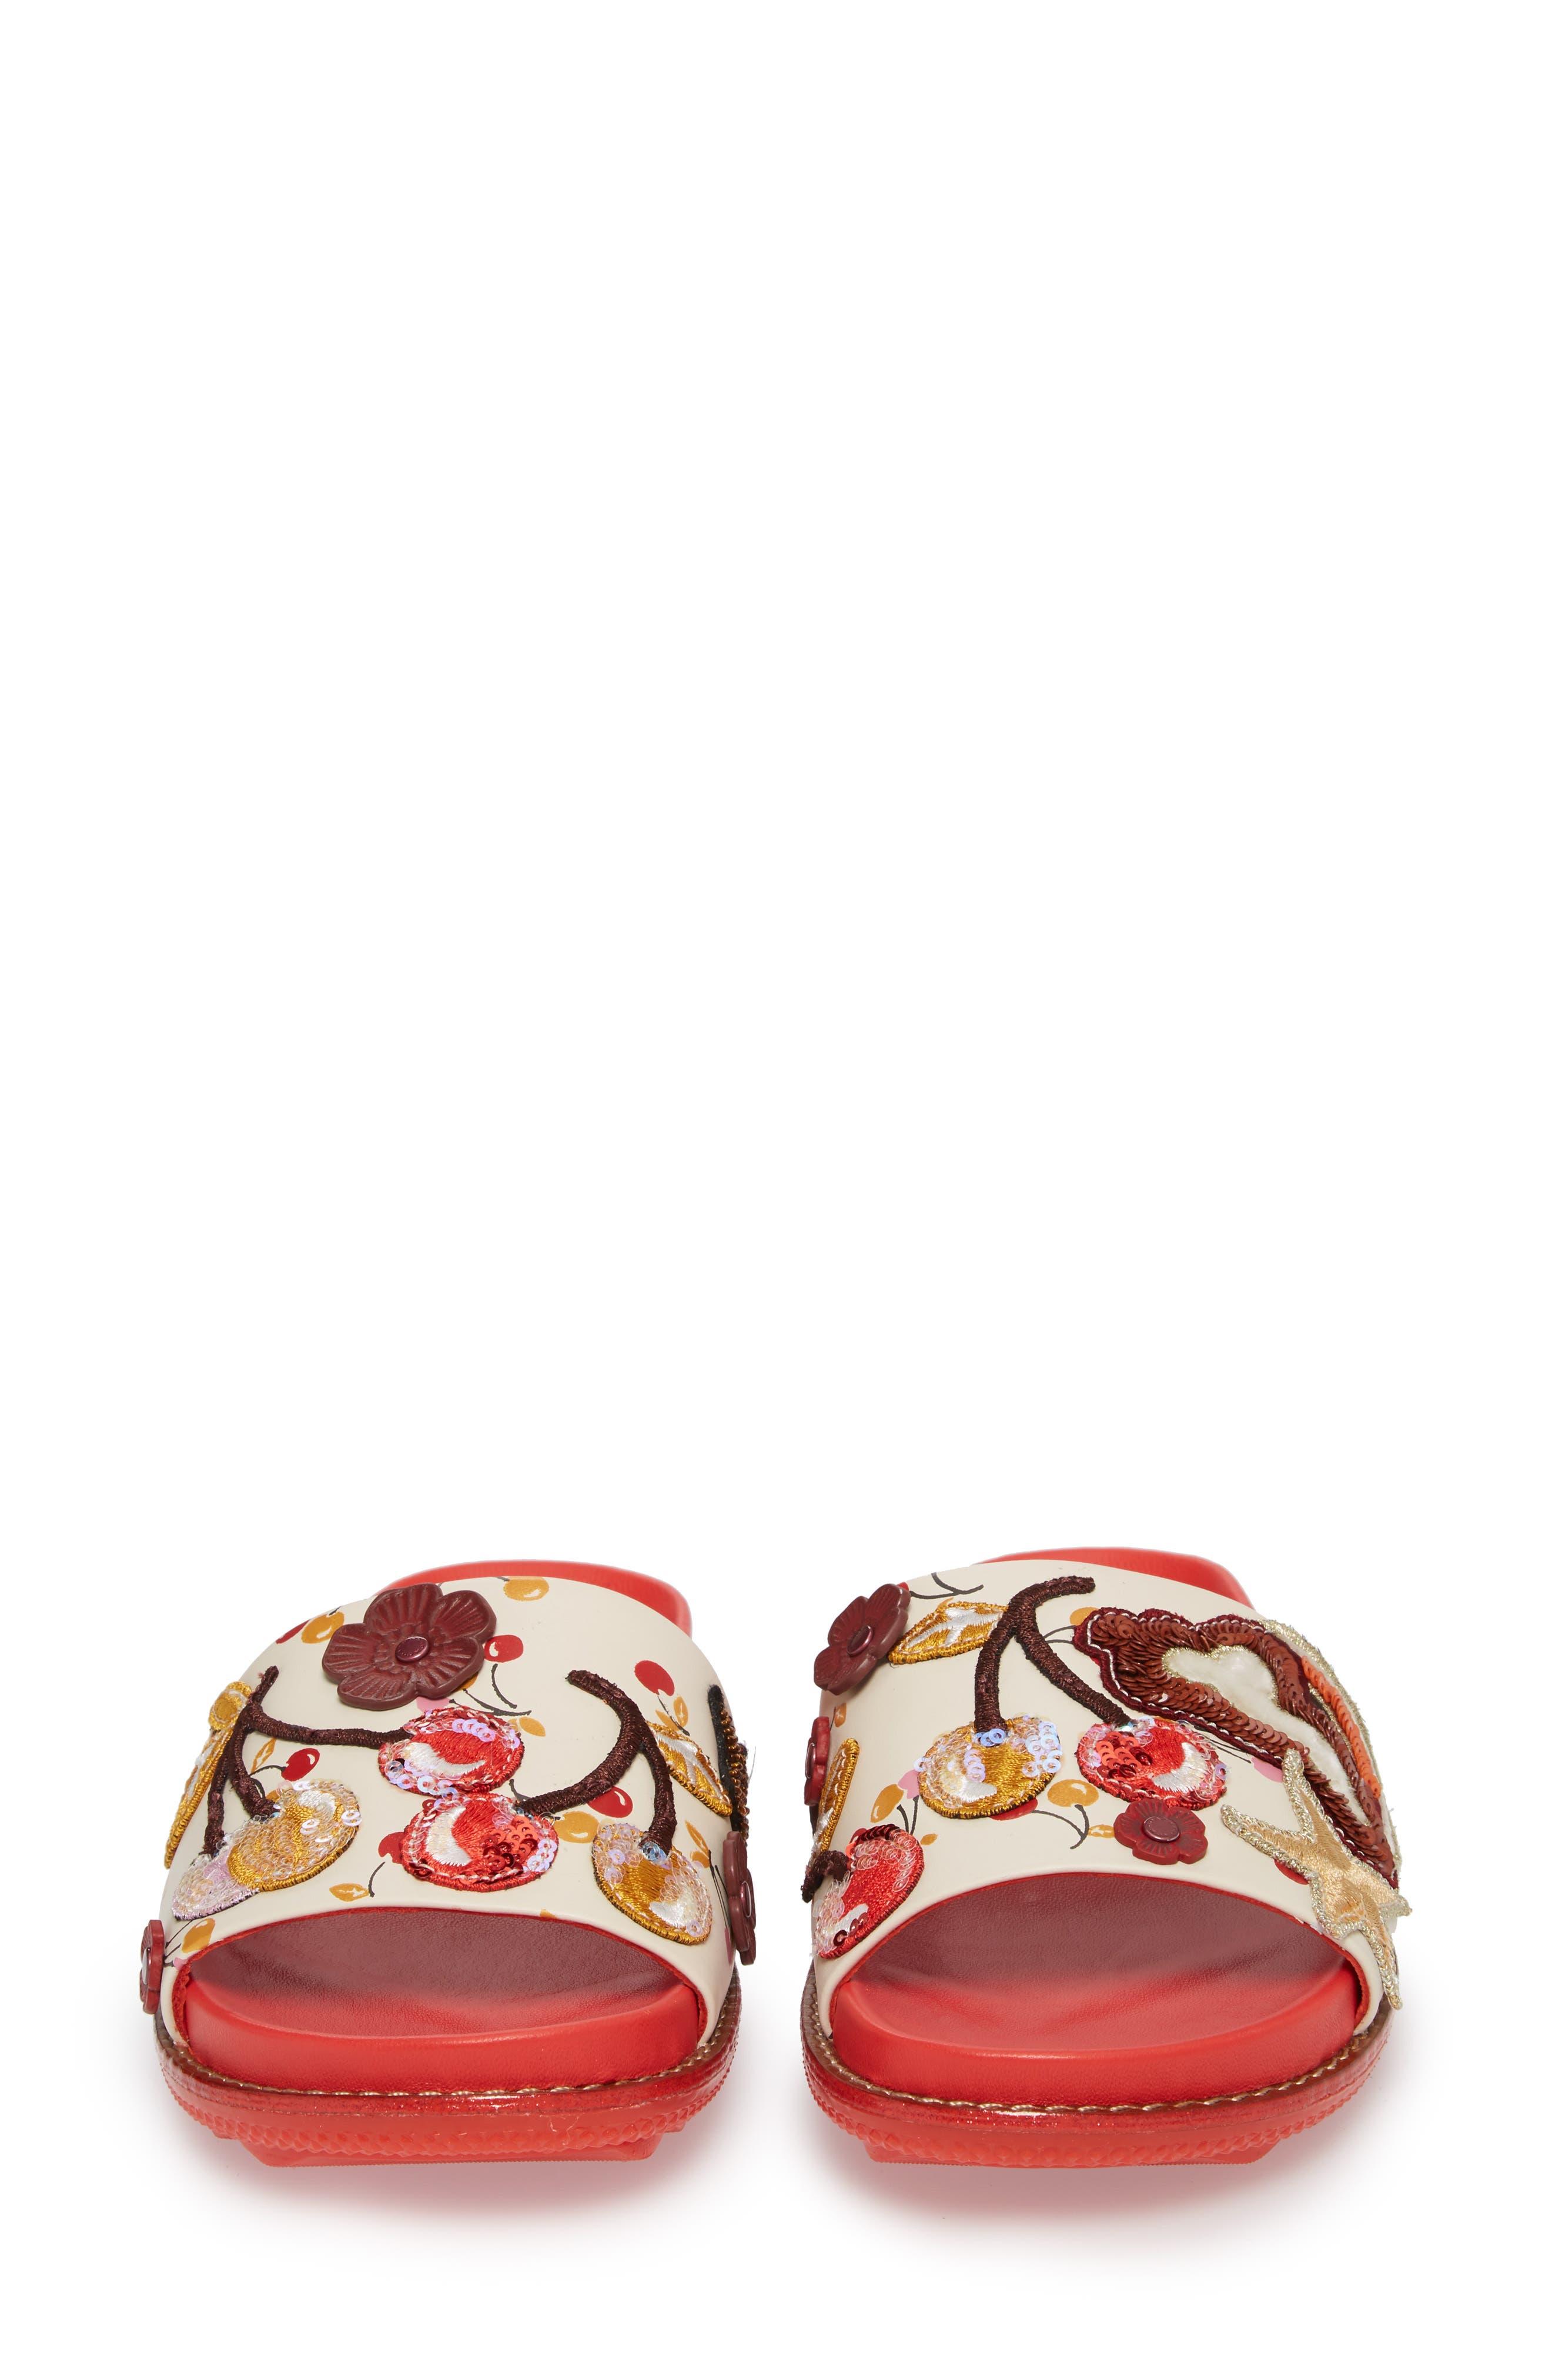 Patch Sport Slide Sandal,                             Alternate thumbnail 4, color,                             Ivory/ Red Leather